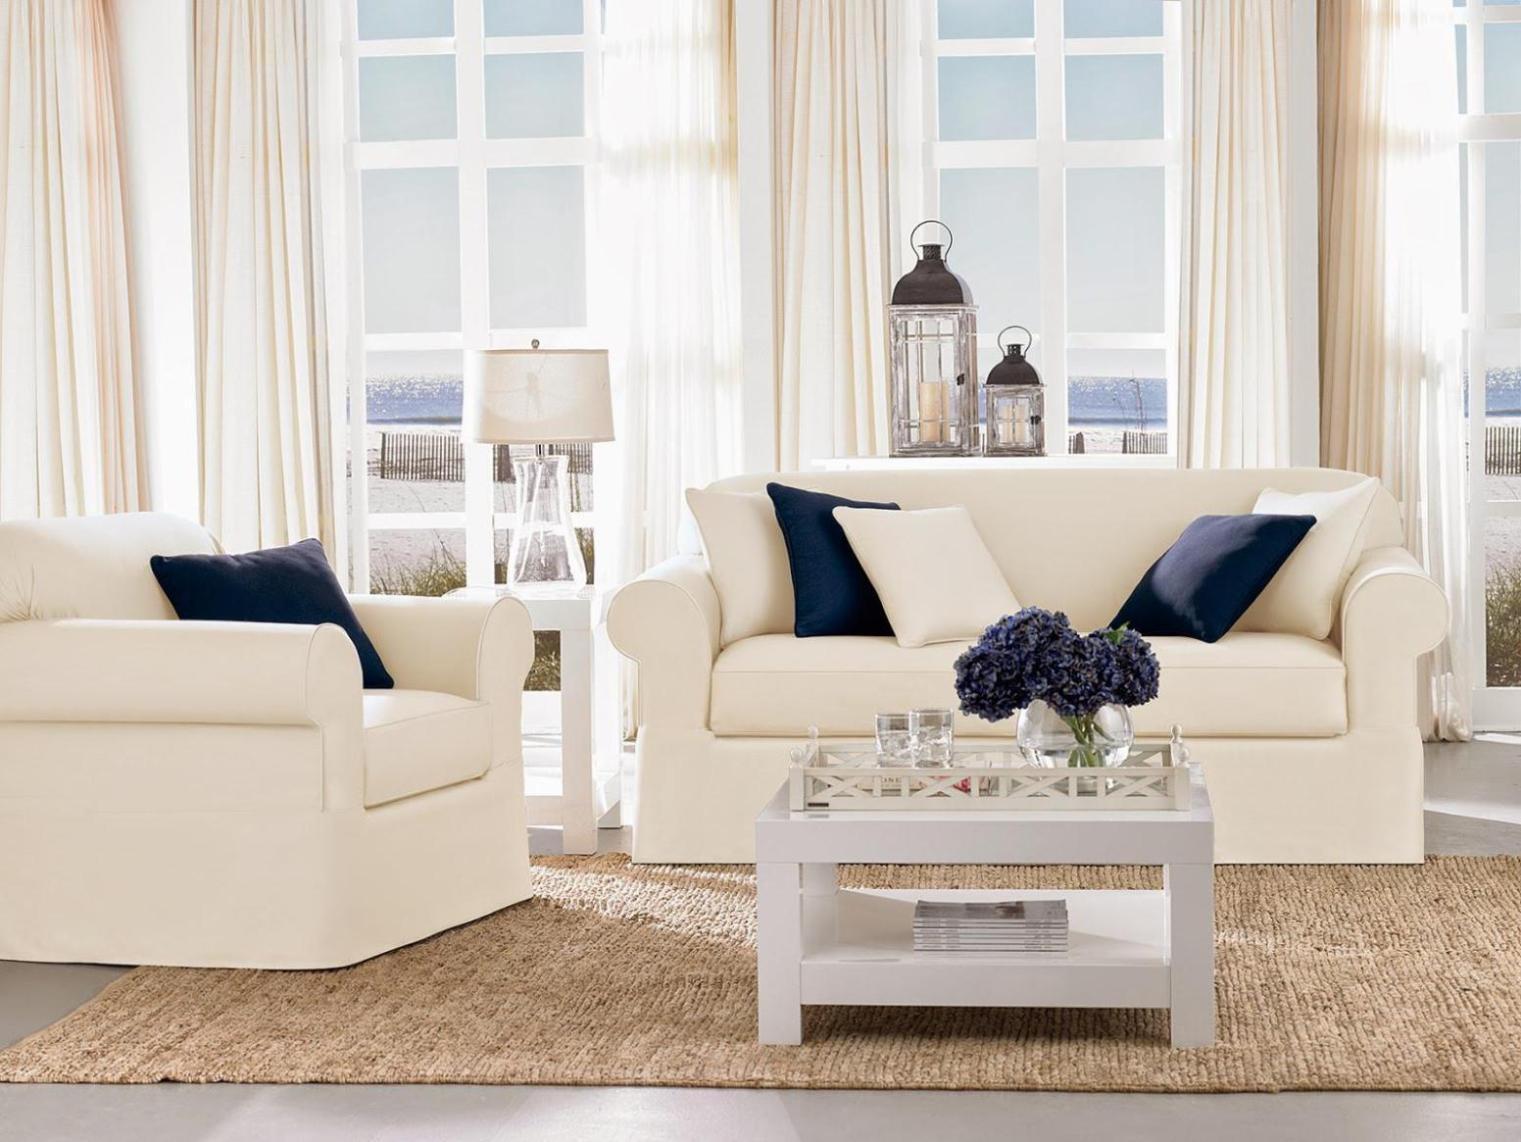 Loveseat Slipcover T Cushion : Doherty House – Contemporary For Loveseat Slipcovers T Cushion (View 12 of 20)